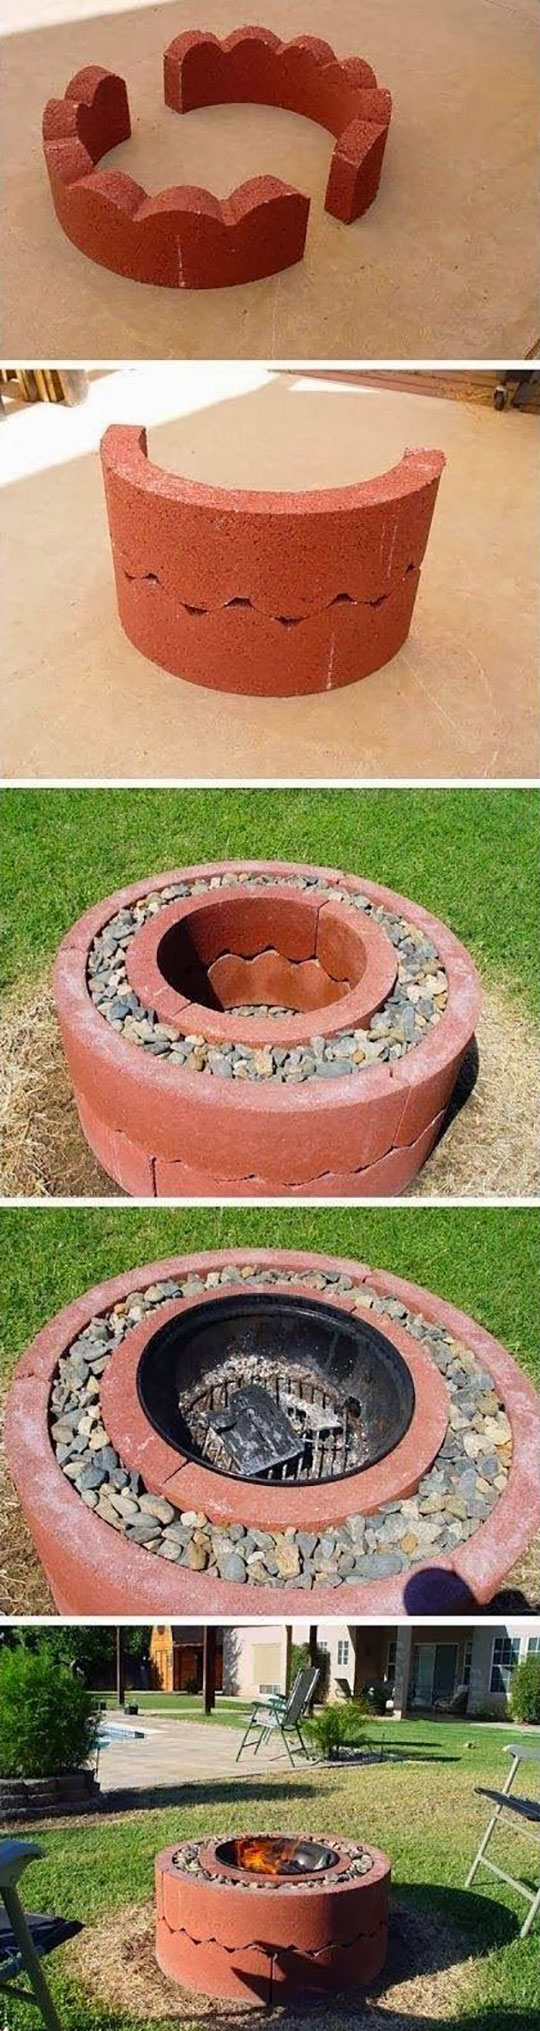 homemade-pit-fire-backyard